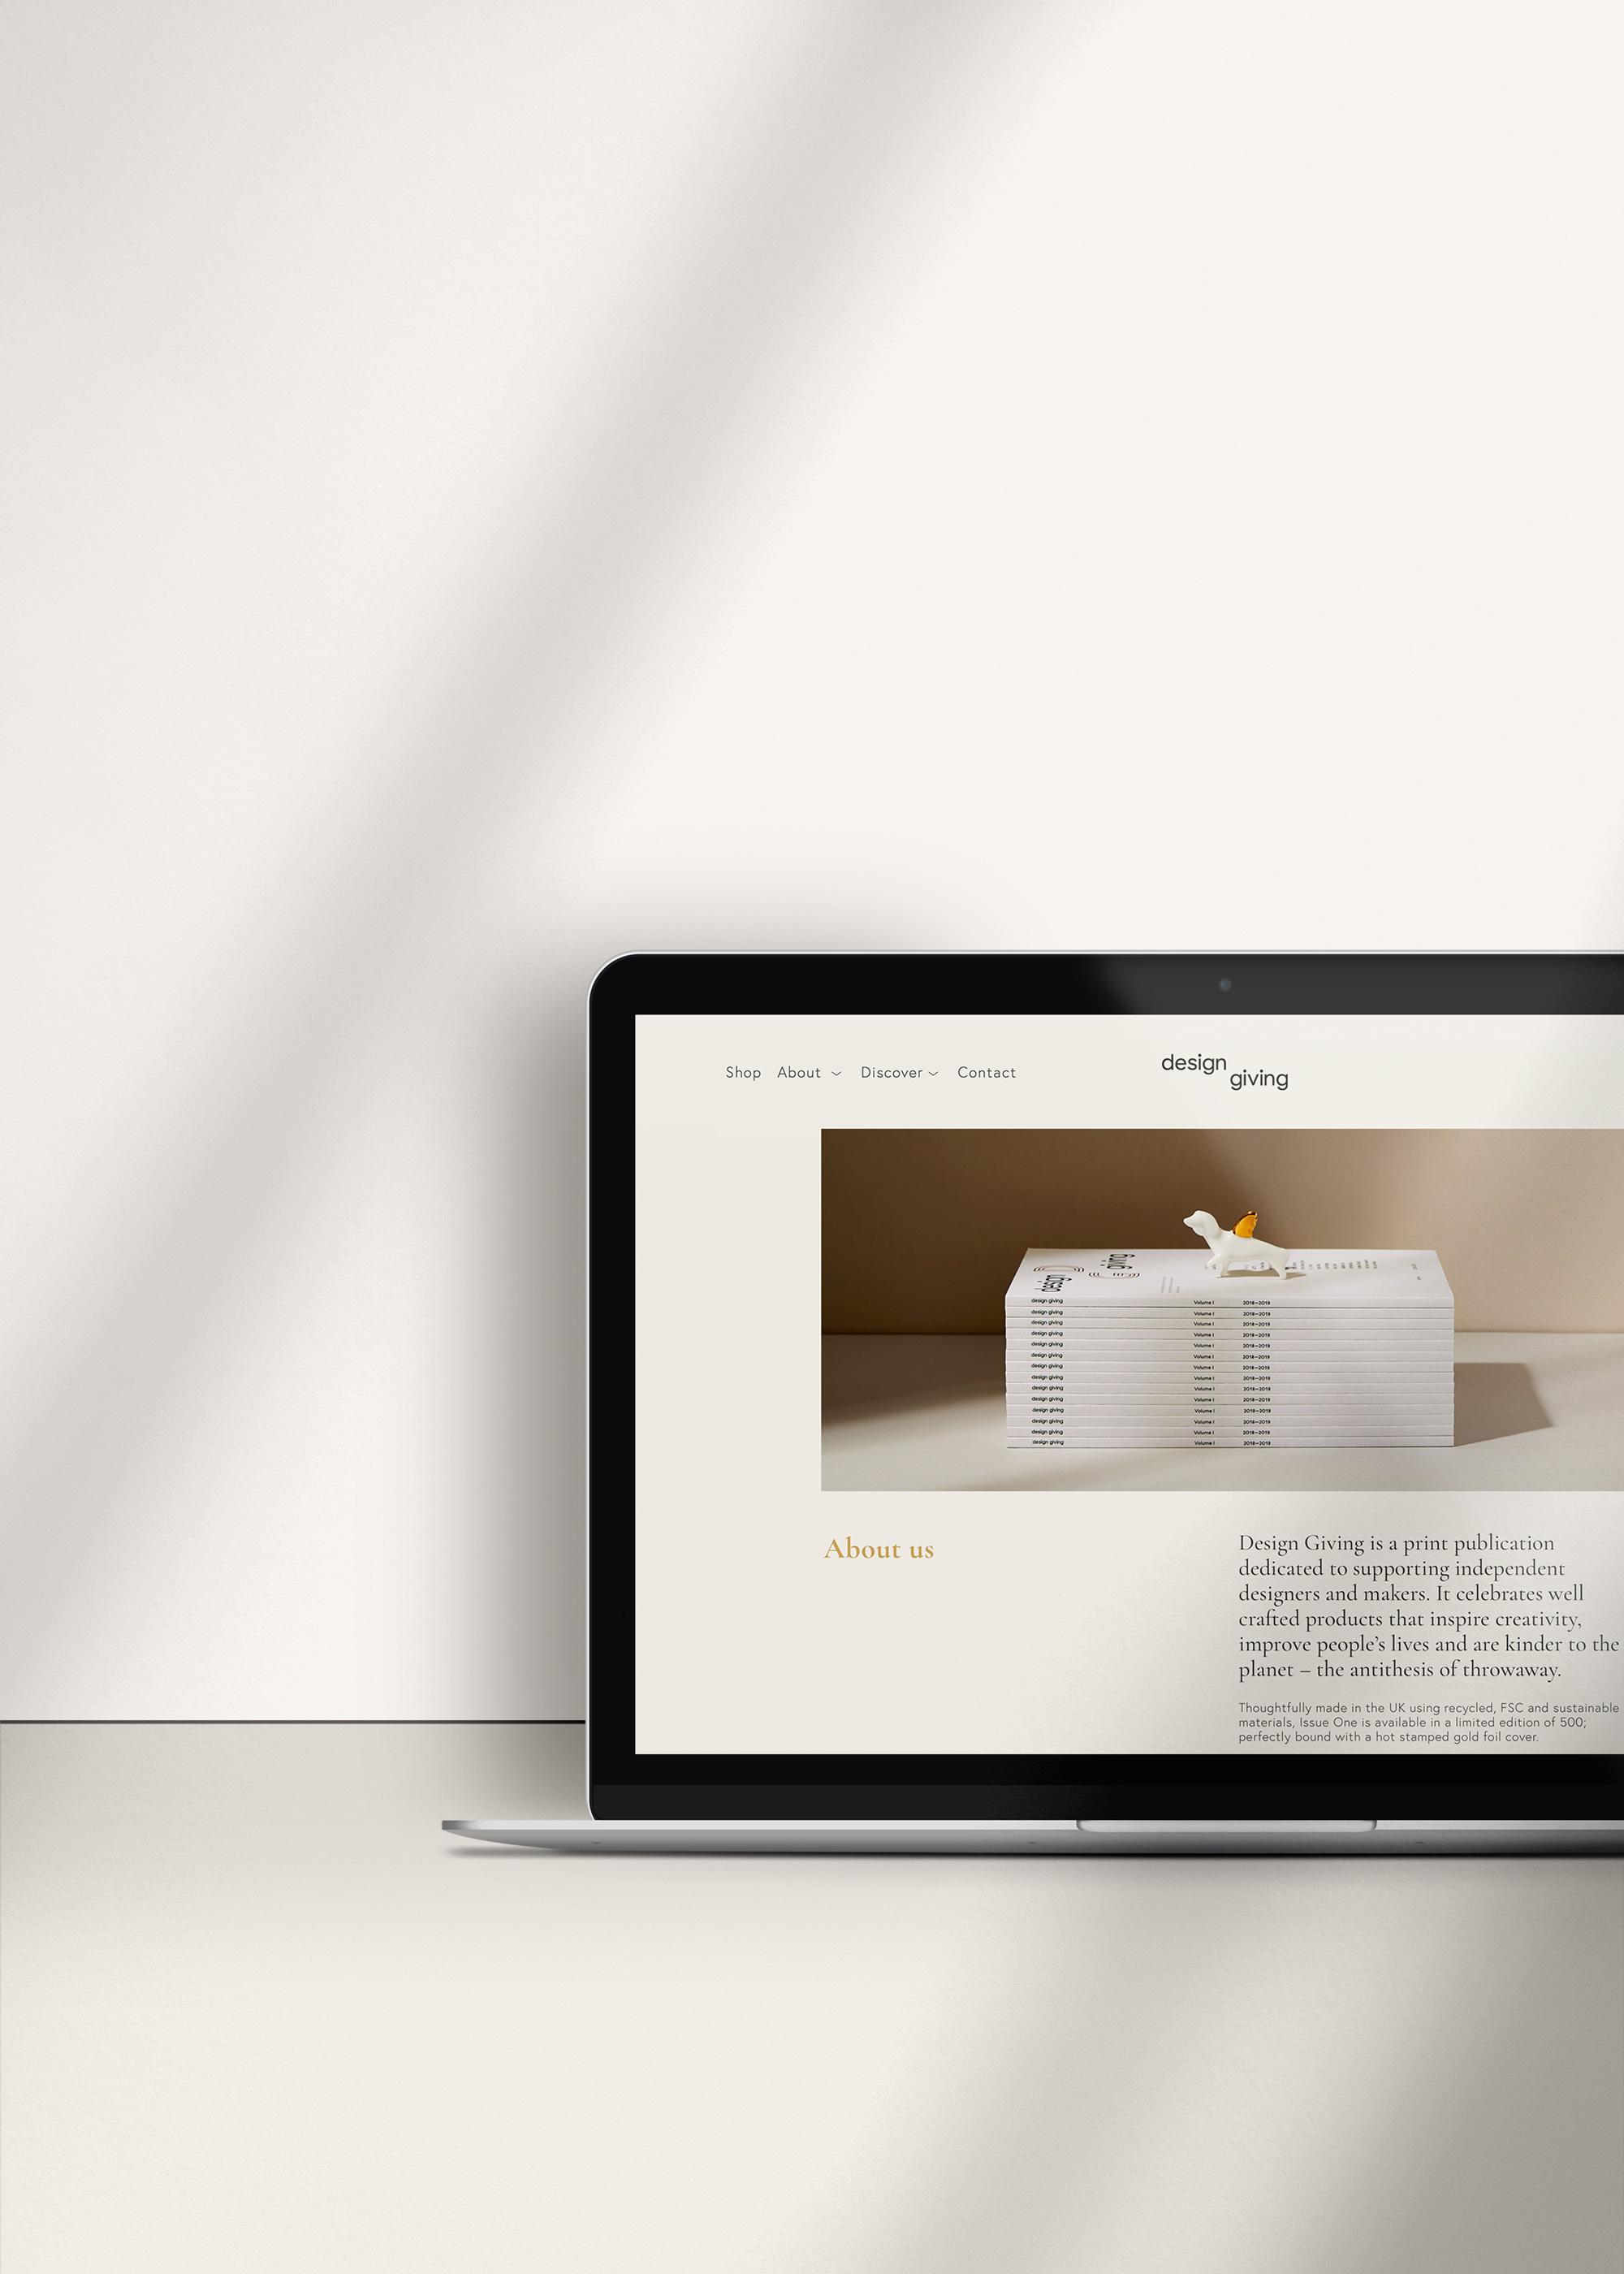 LJB-Studio_website_digital_design_services_E_5x7.jpg